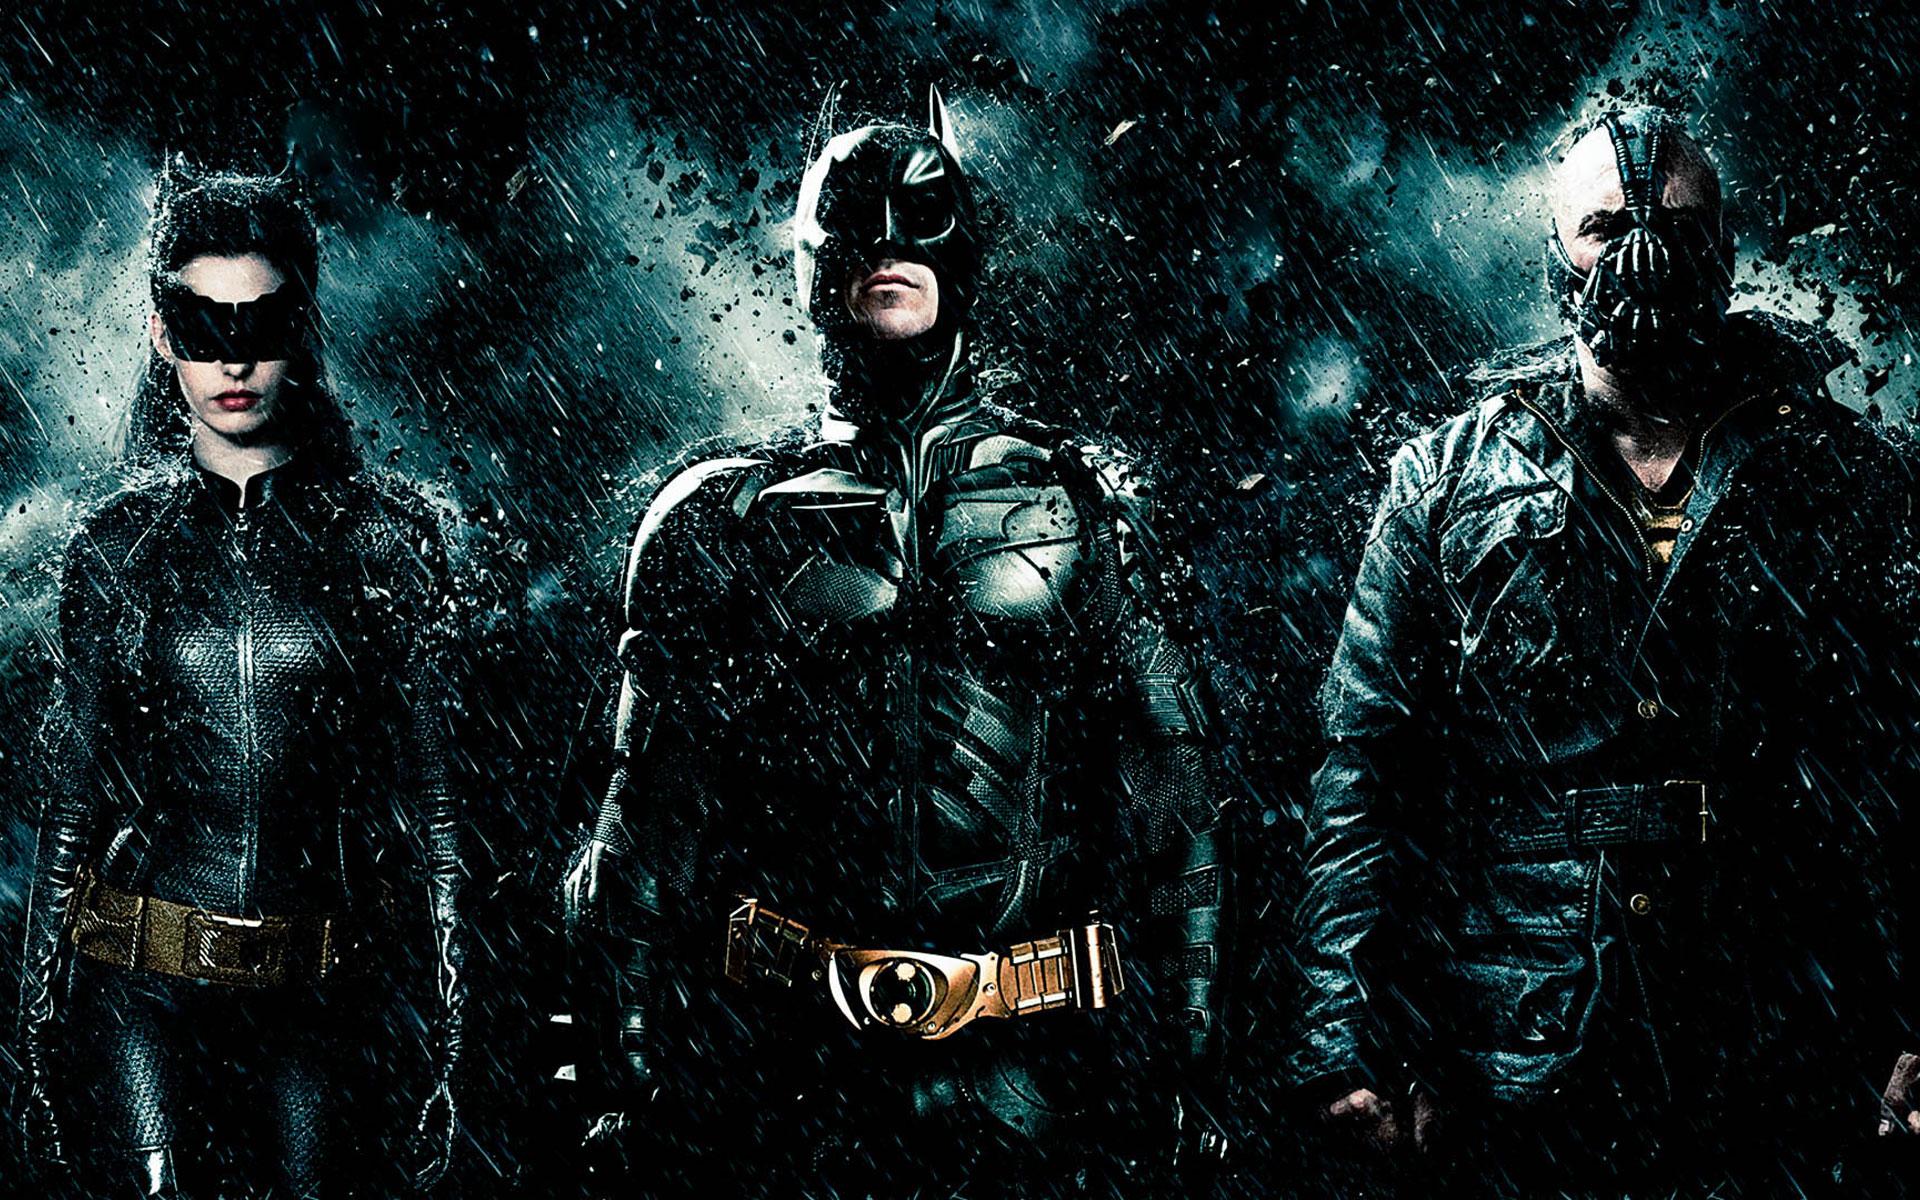 The-Dark-Knight-Rises-7_0.jpg